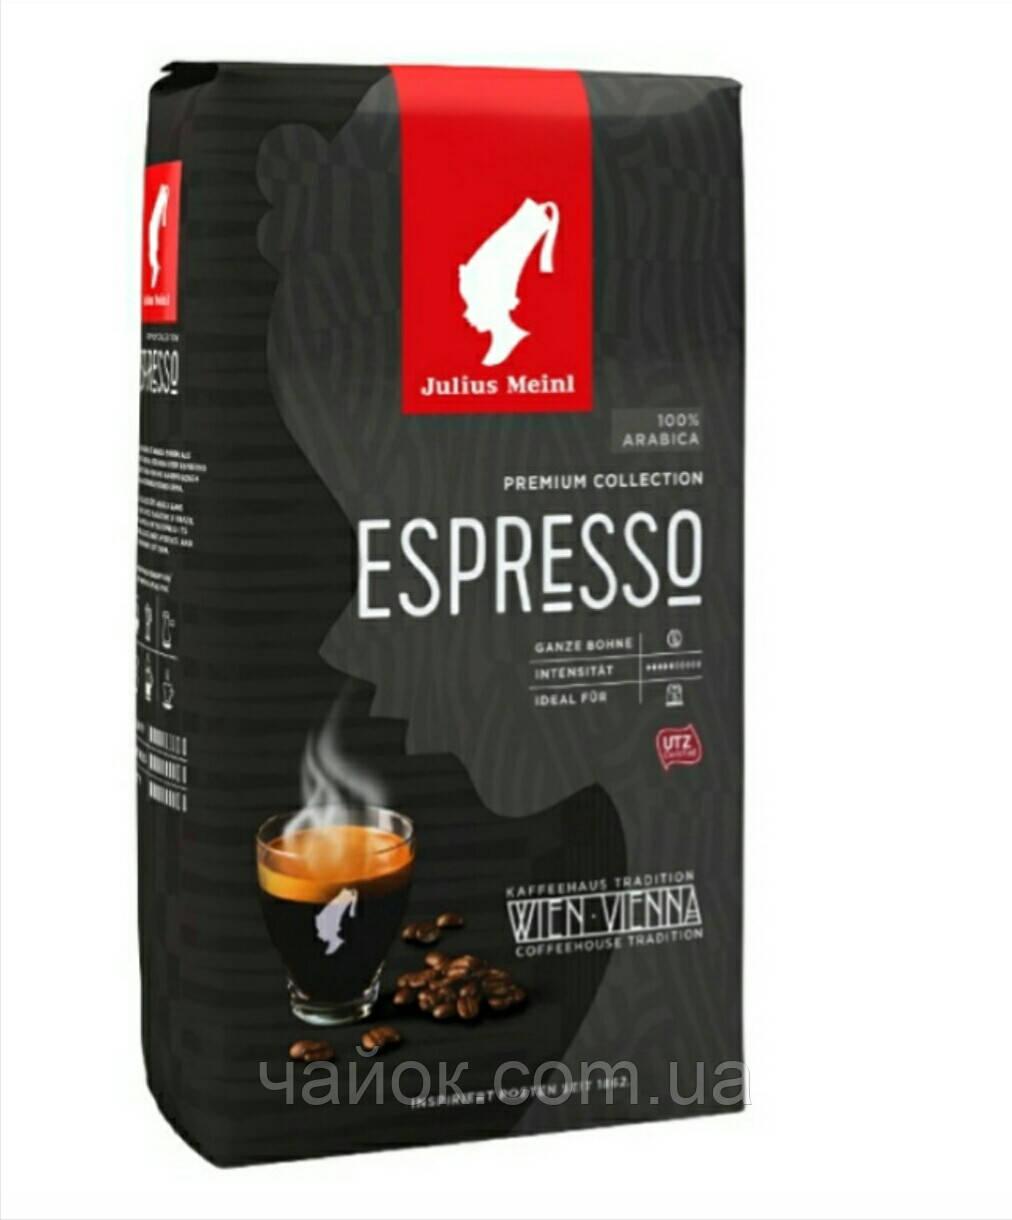 Кофе в зернах Julius Meinl Espresso Wiener Art 1 кг